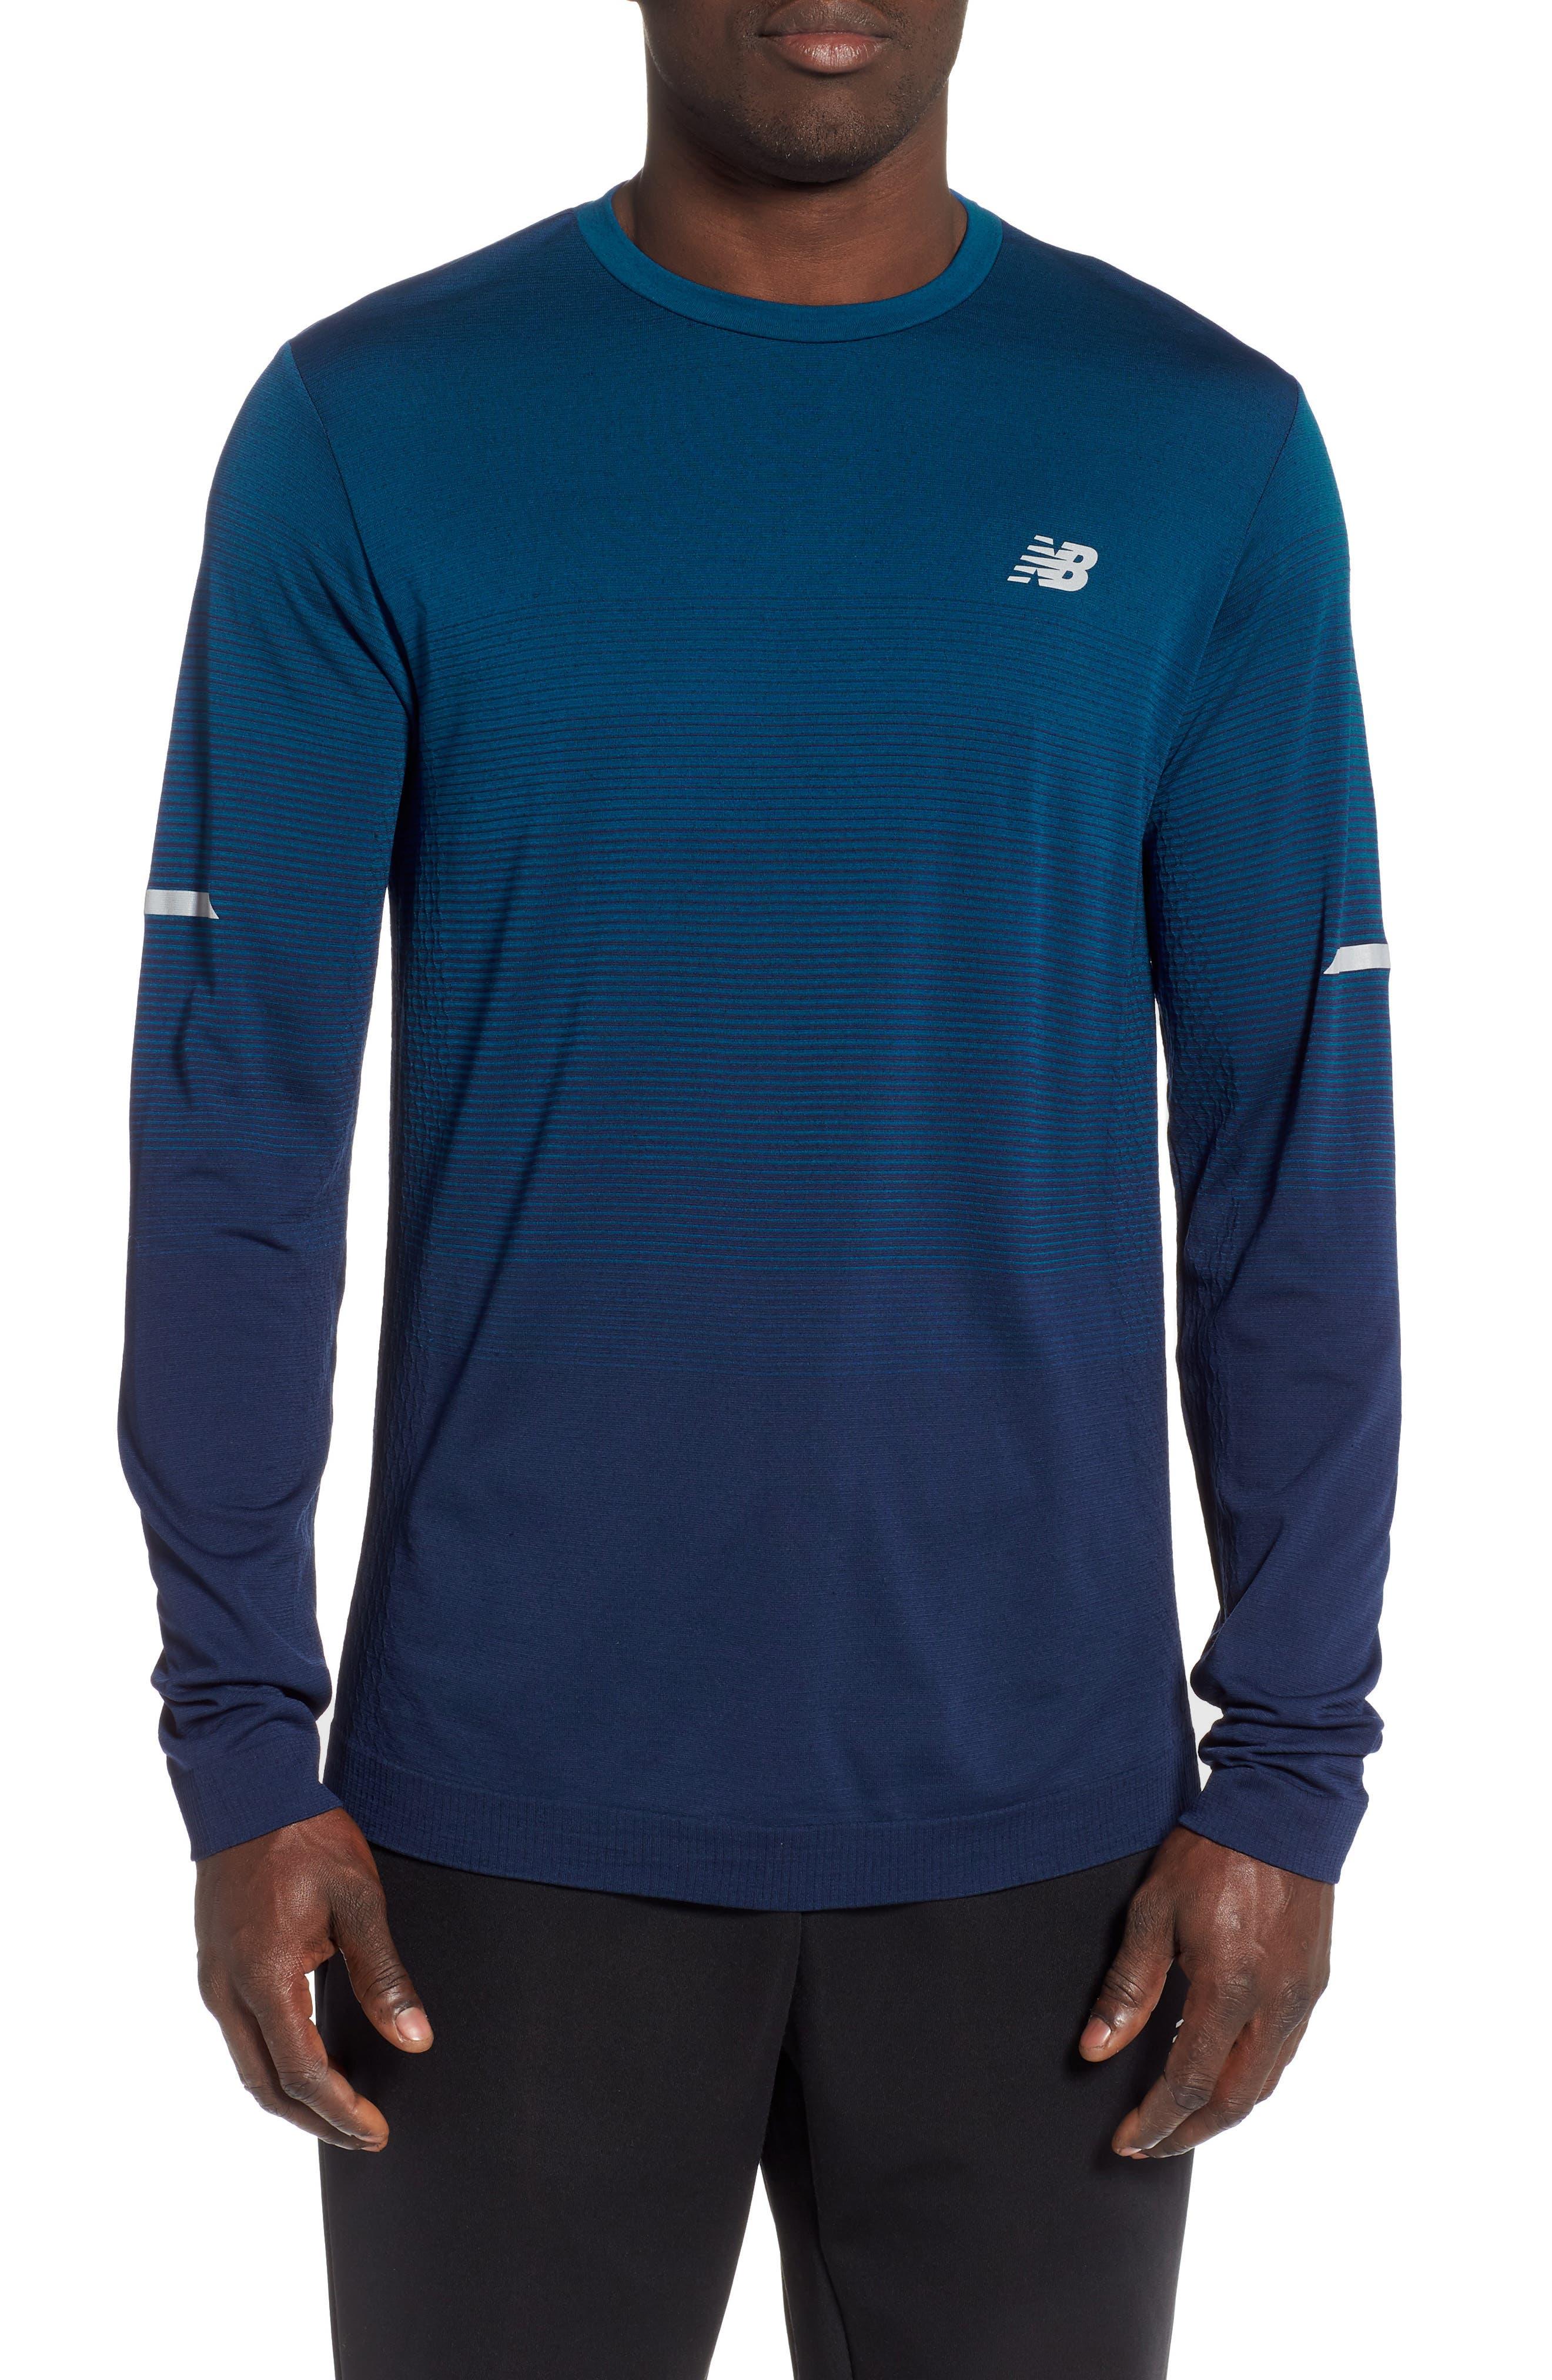 New Balance Ombre Long Sleeve Performance T-Shirt